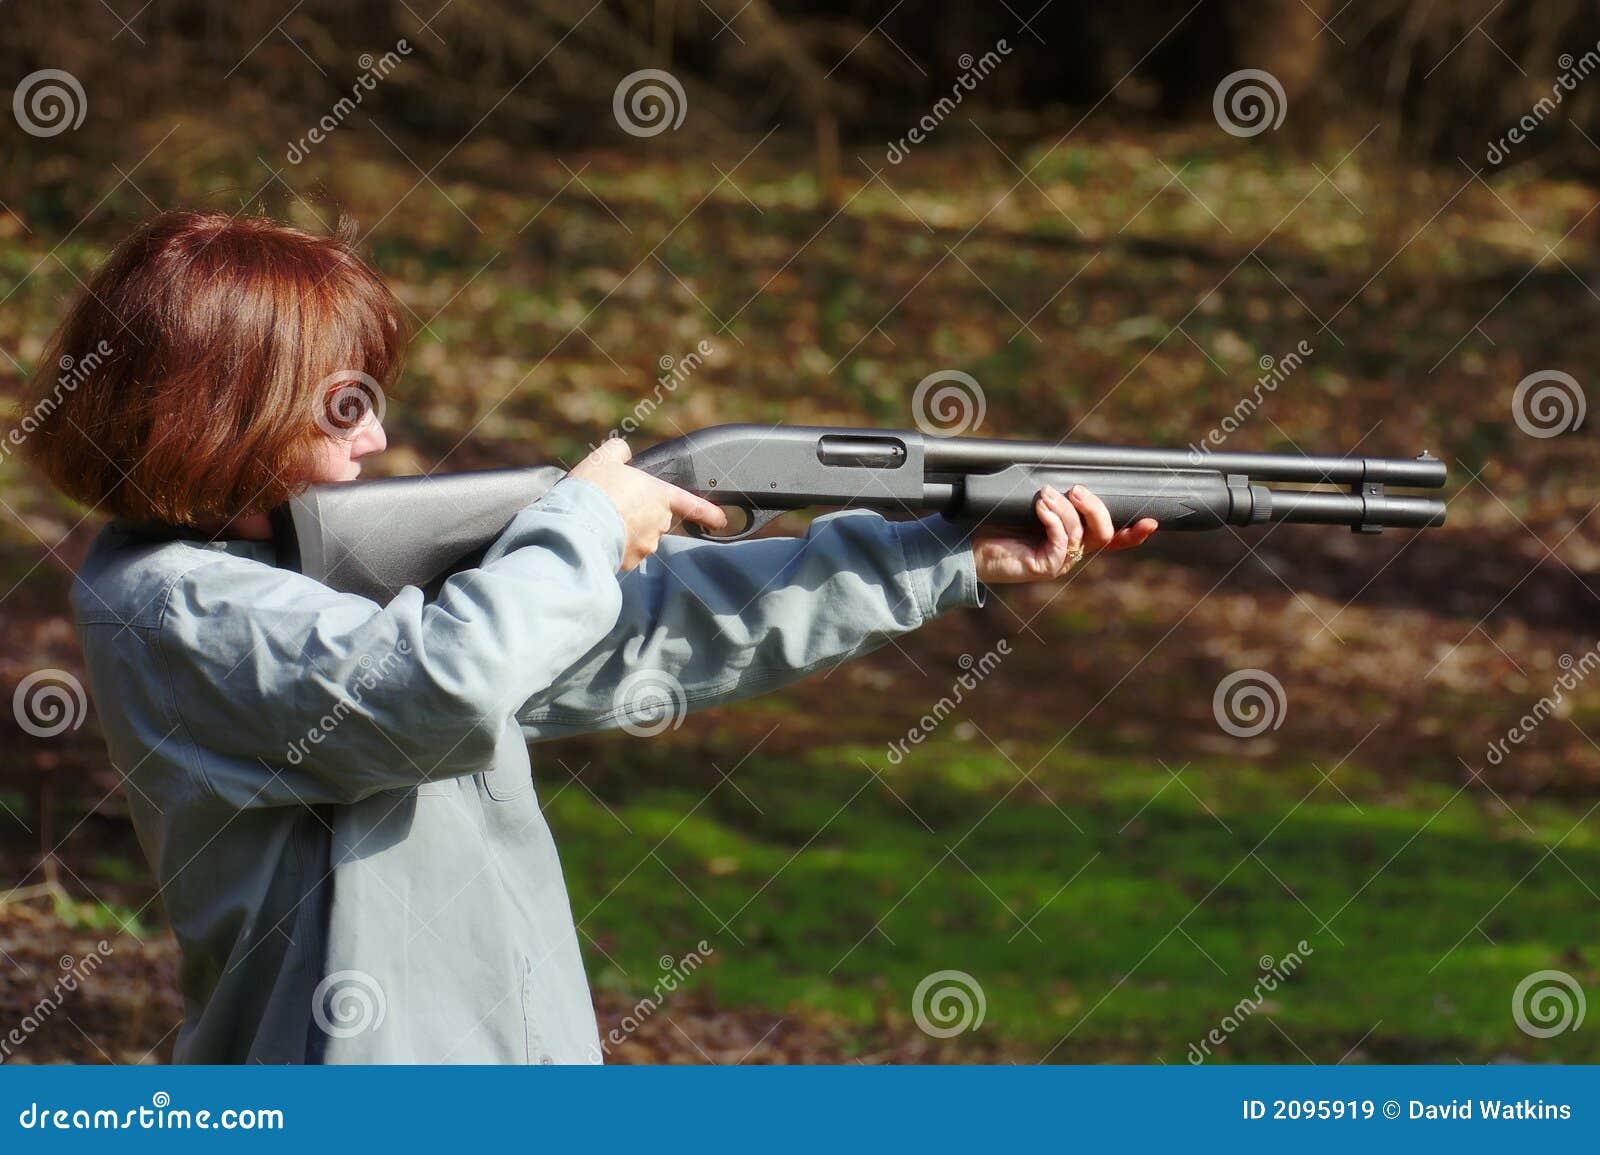 Woman aiming a shotgun stock image. Image of firearm ...